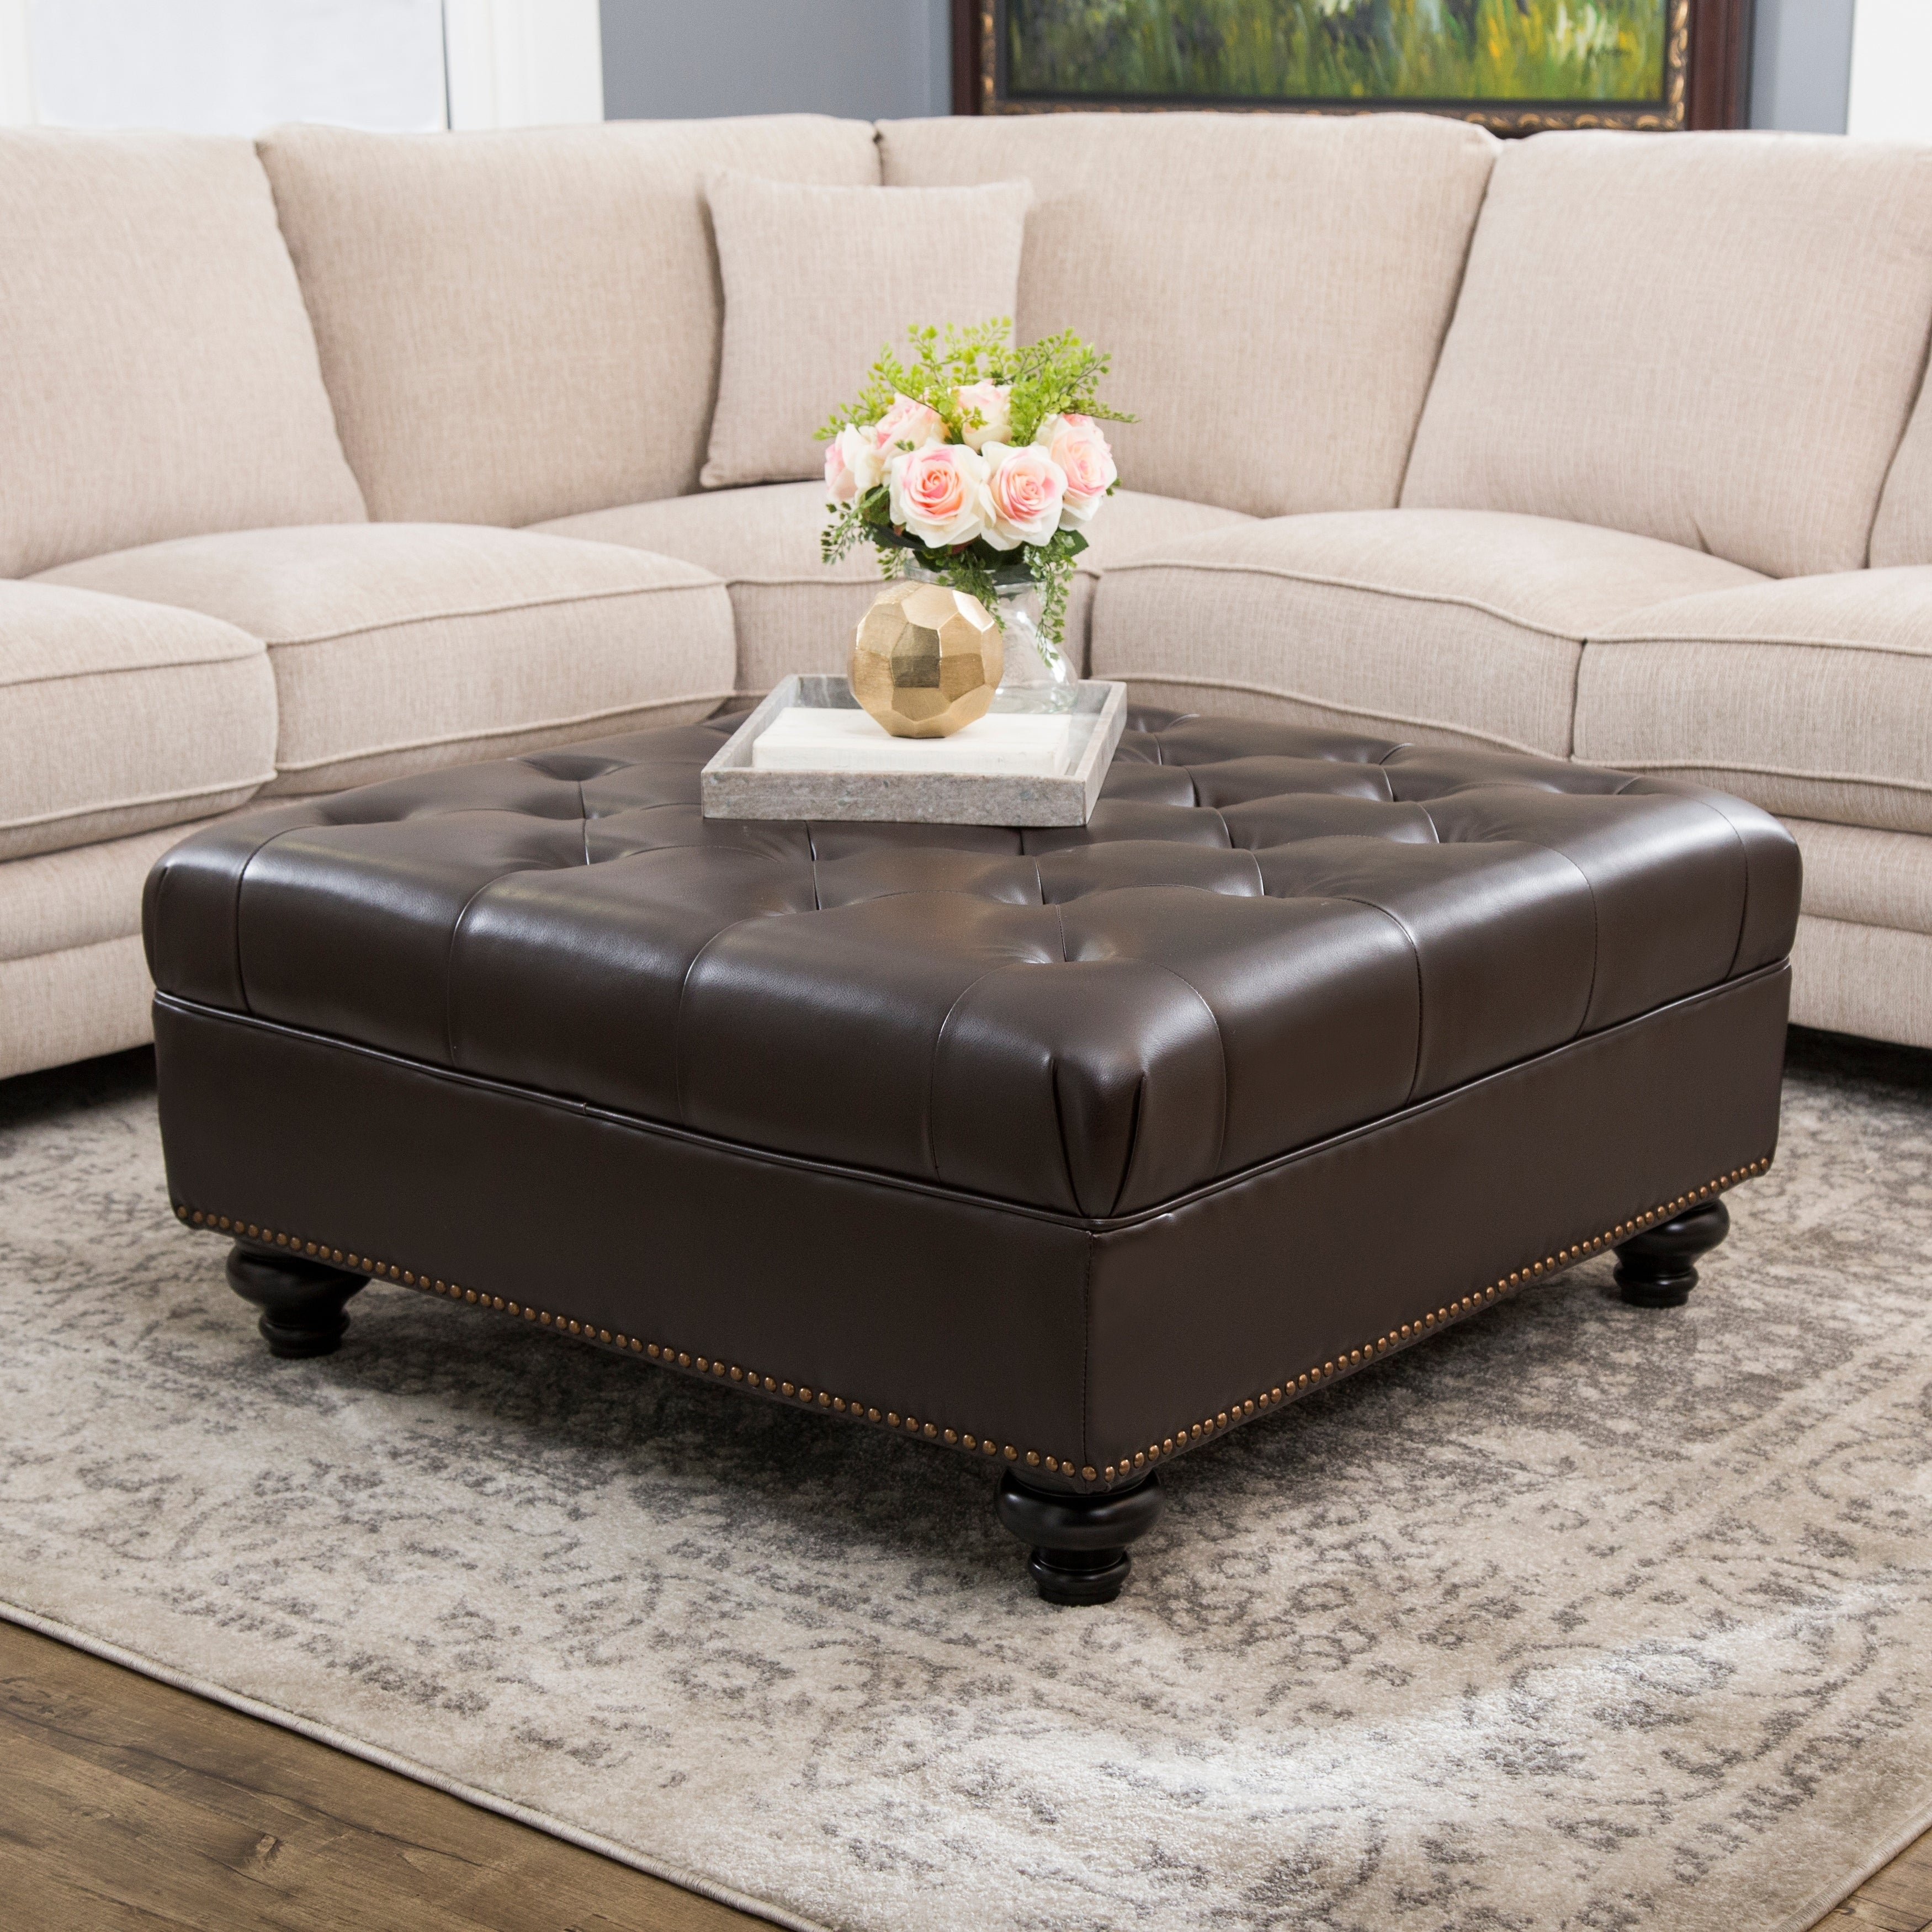 Brilliant Abbyson Frankfurt Tufted Brown Leather Ottoman Machost Co Dining Chair Design Ideas Machostcouk